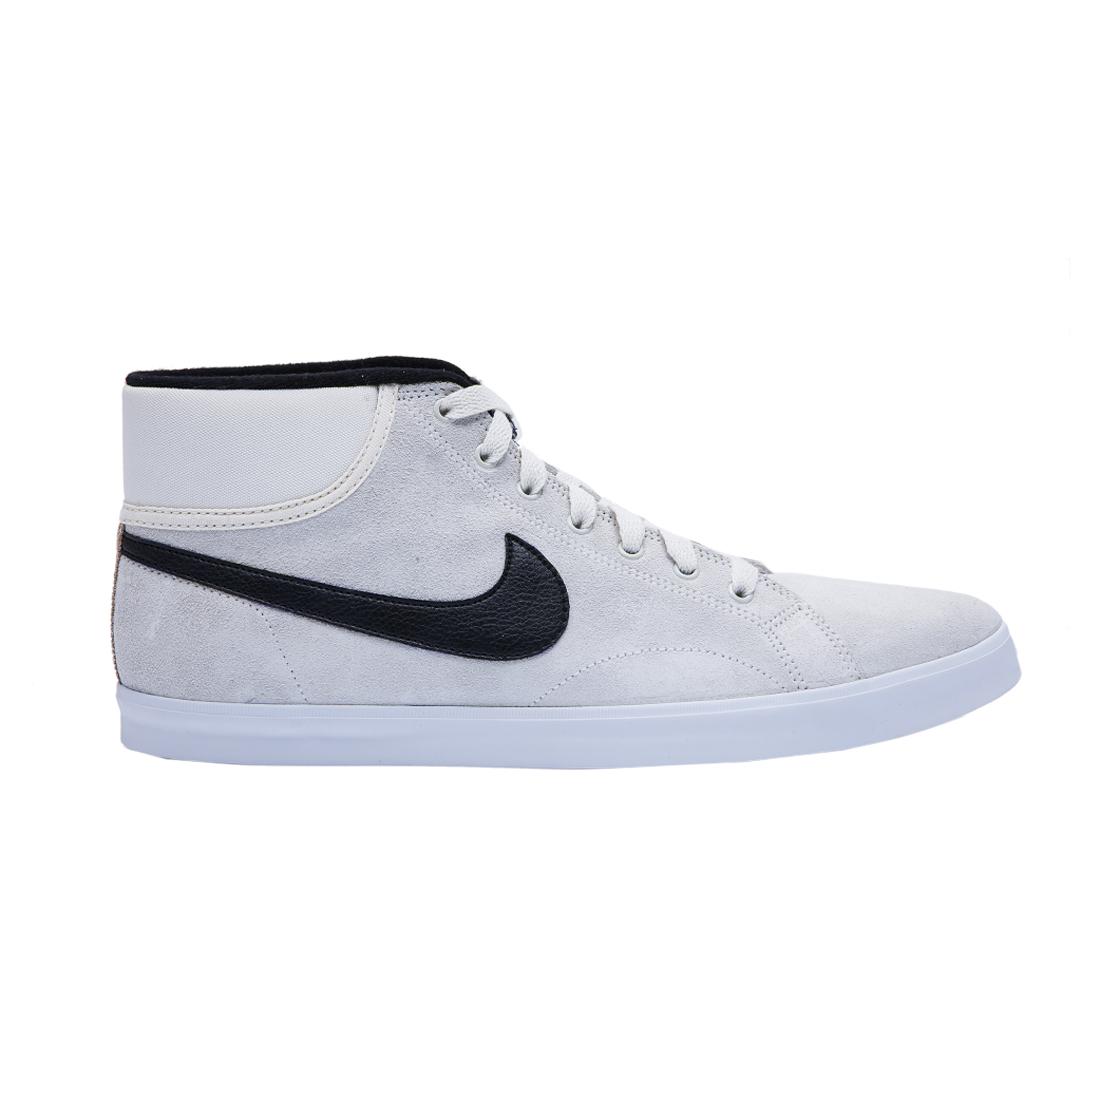 NIKE – Ανδρικά παπούτσια NIKE EASTHAM MID εκρού